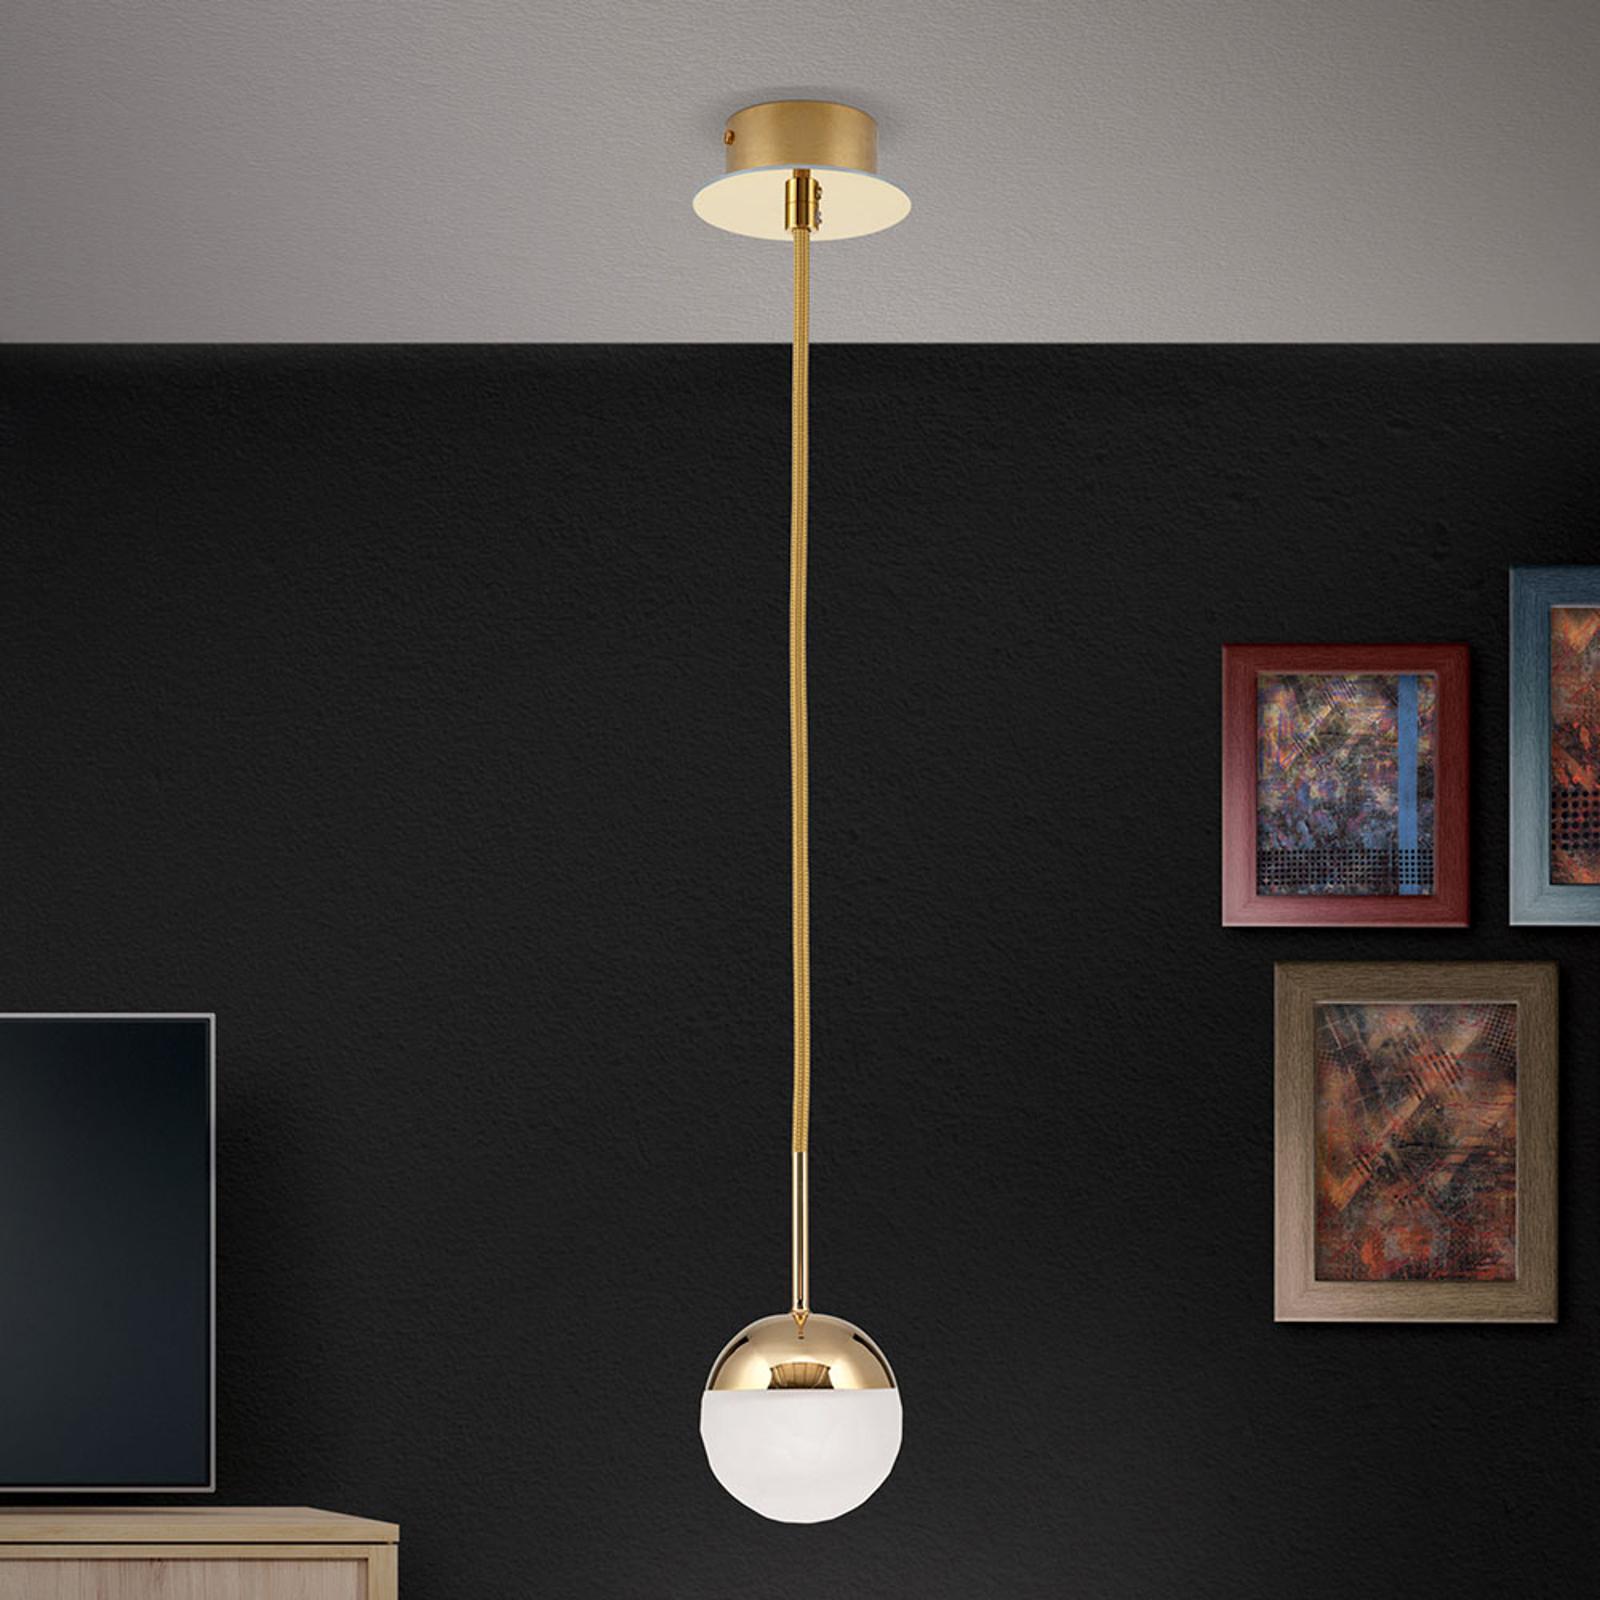 Lampa wisząca LED Ball, 1-punktowa, złota